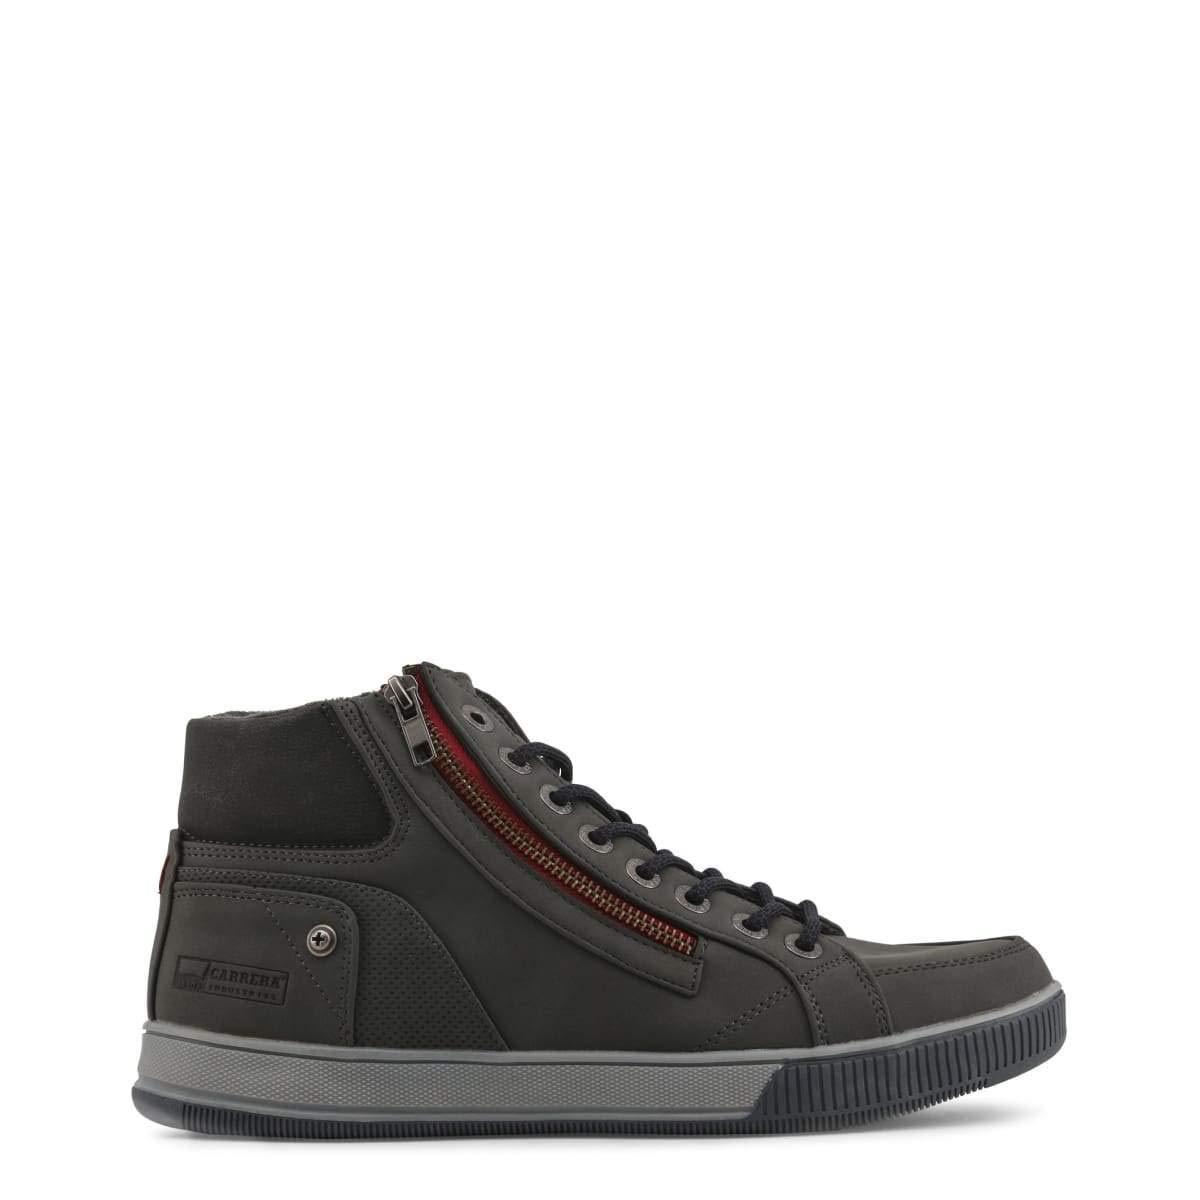 Carrera Jeans - CAM825020 Fashion B07HQW3ZTX Fashion CAM825020 Sneakers 433db9